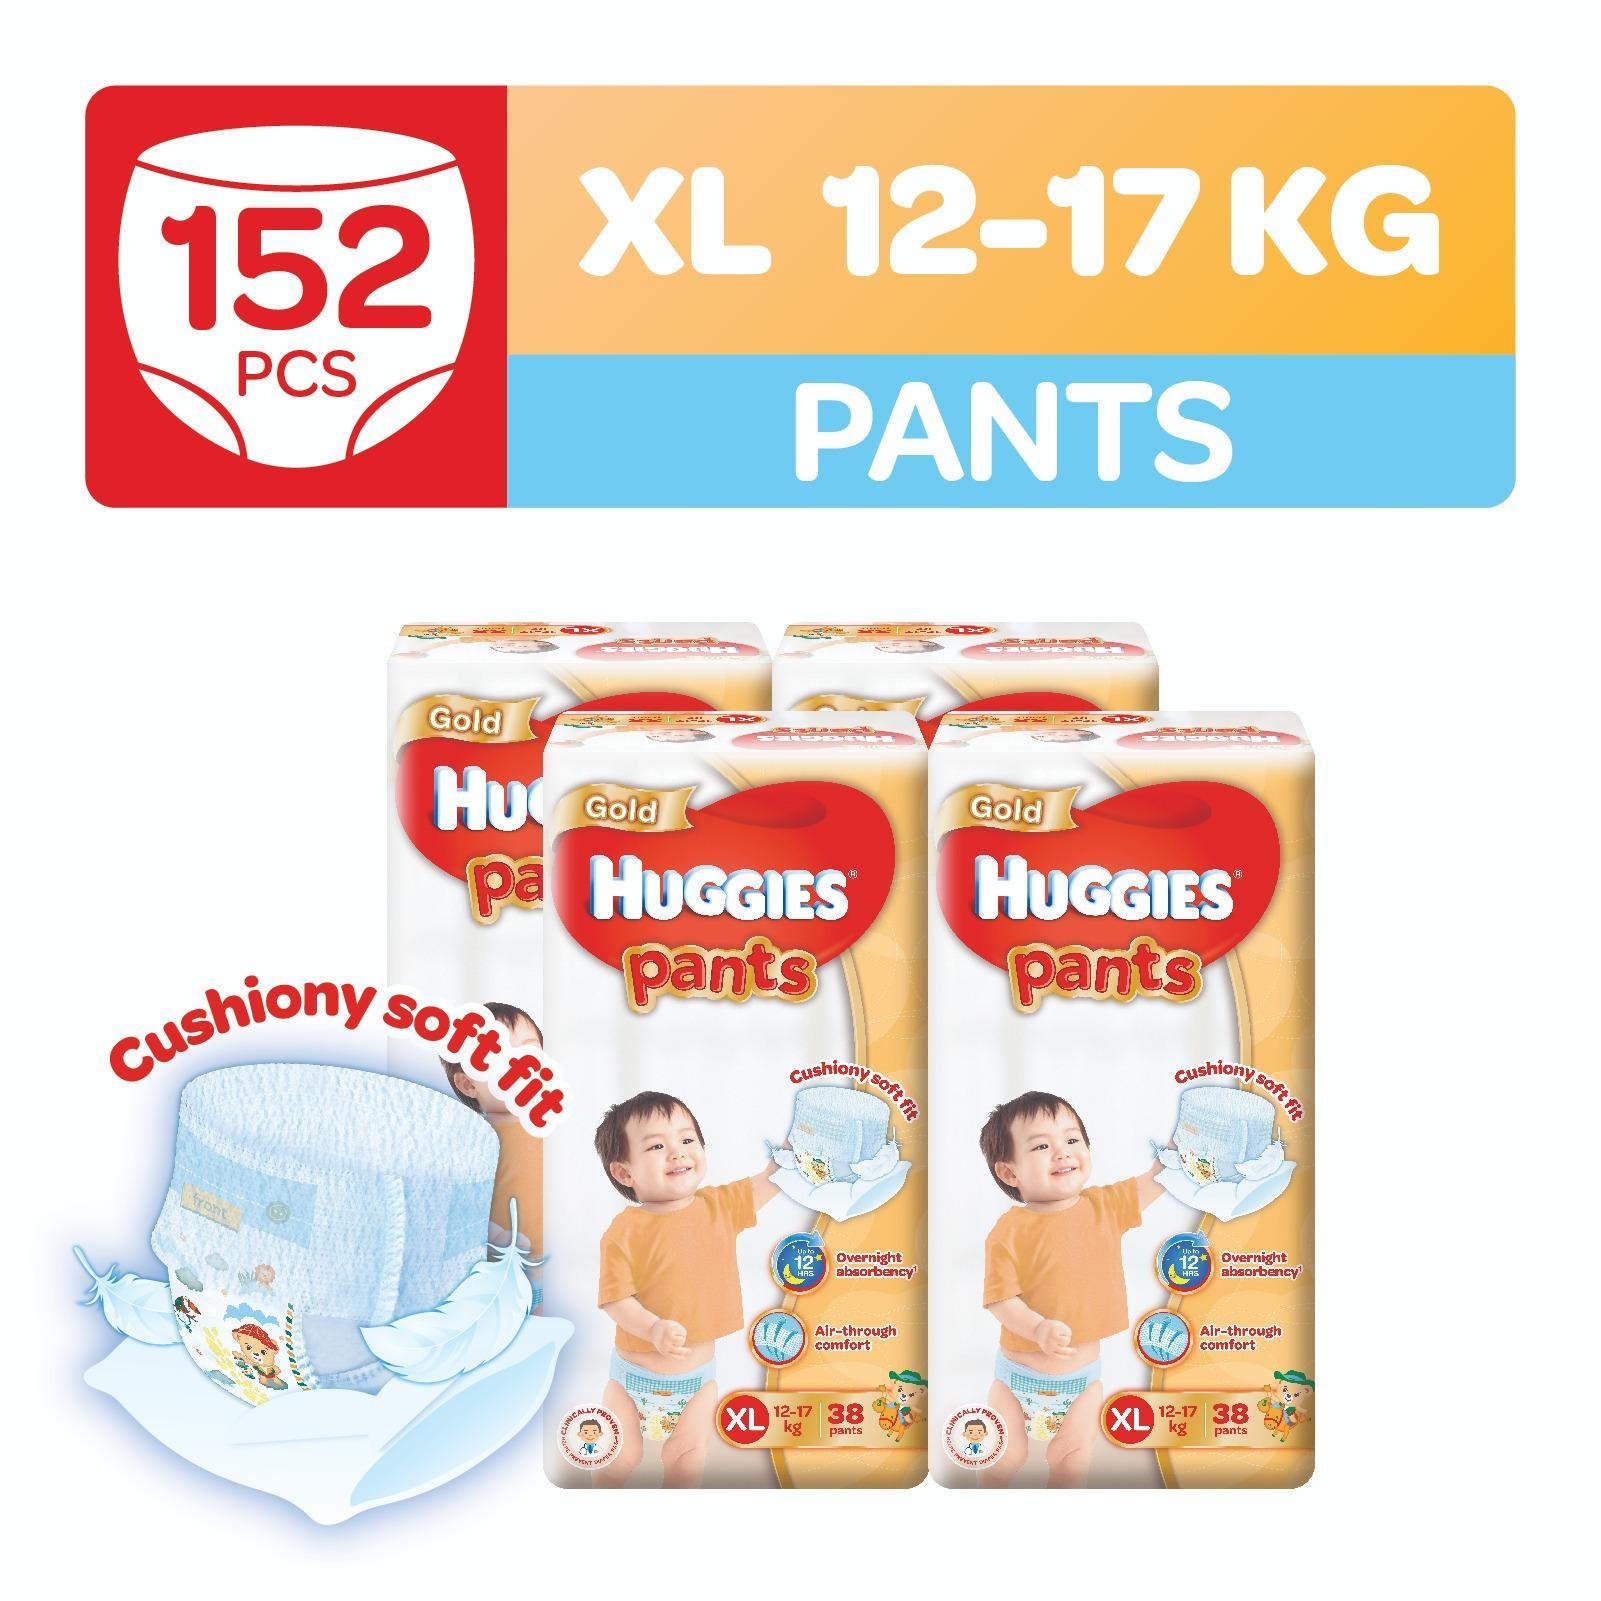 Discount Huggies Gold Pullup Pants Xl 38Pcs X 4 Packs